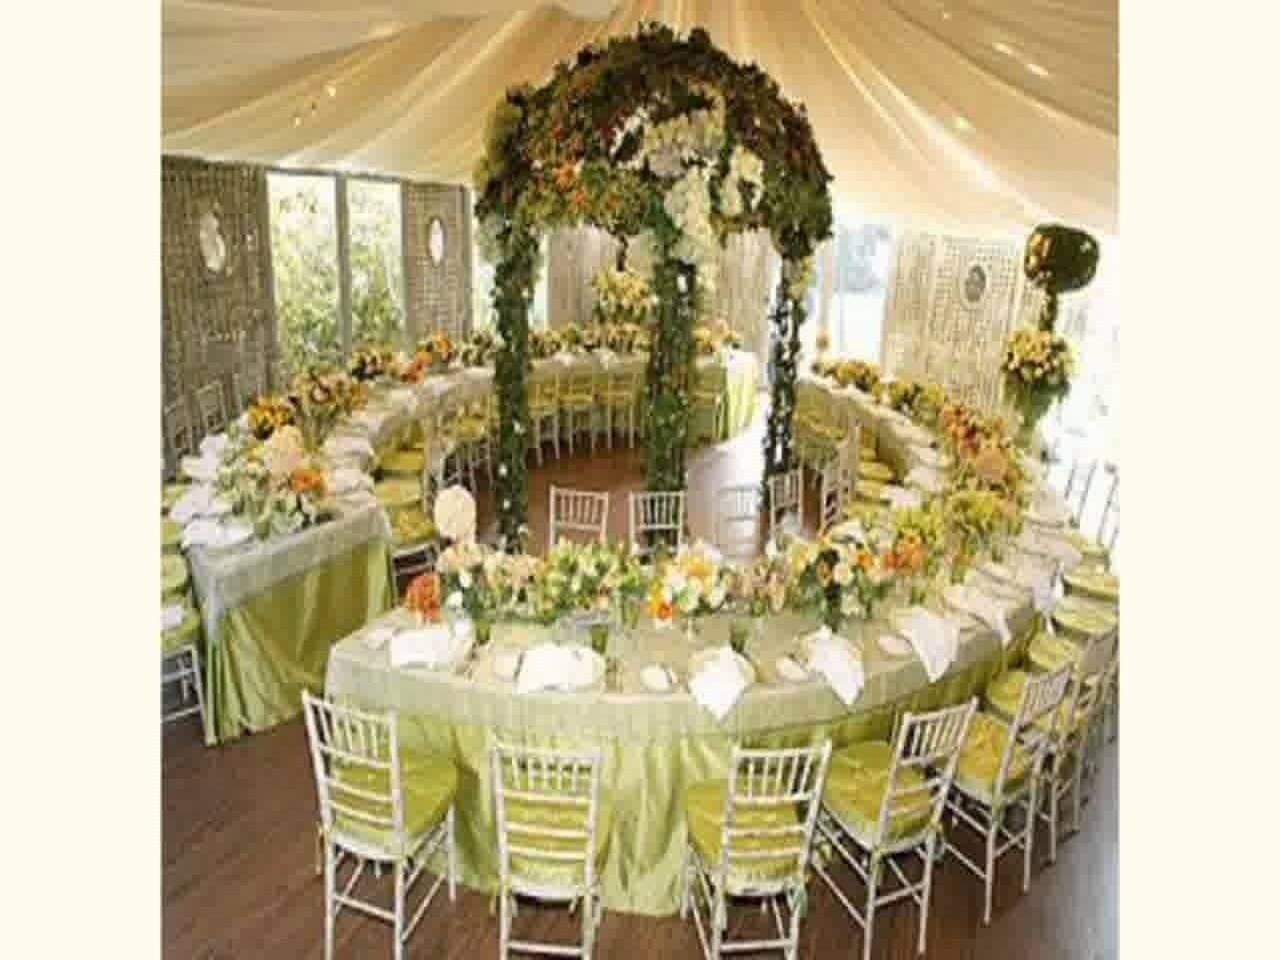 10 Great Wedding Decoration Ideas For Church church wedding decoration ideas 2015 youtube